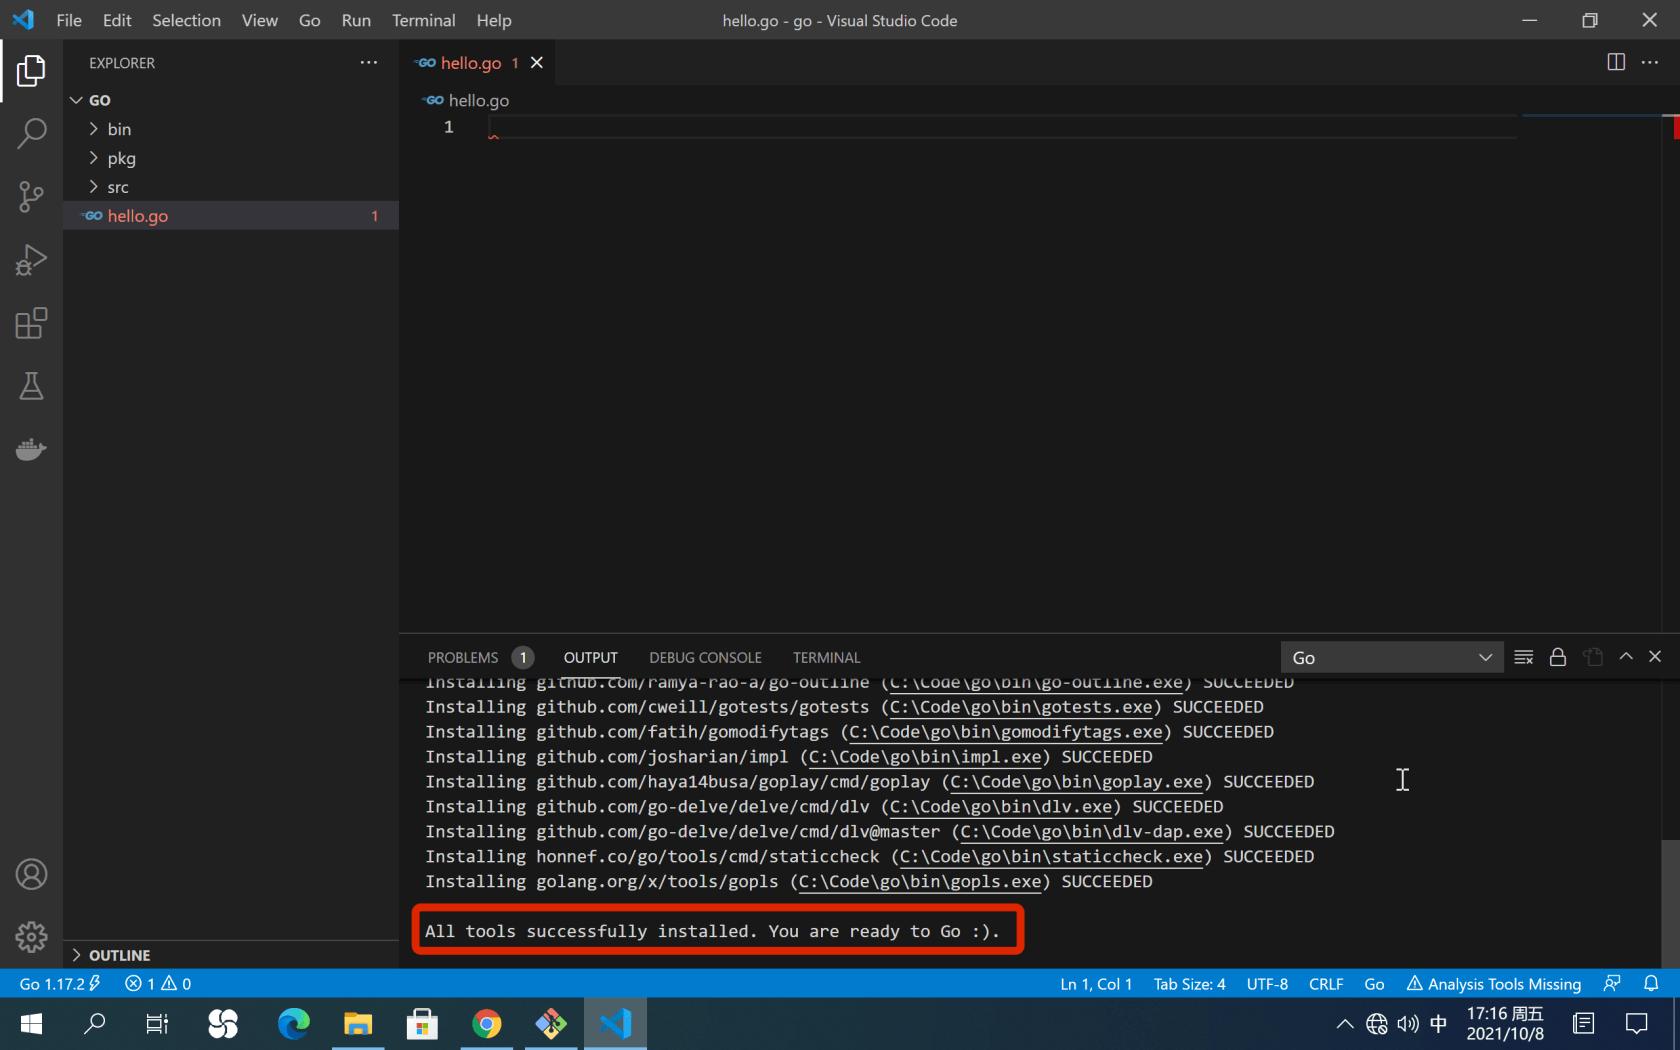 002. Go 开发环境配置(Windows 10)